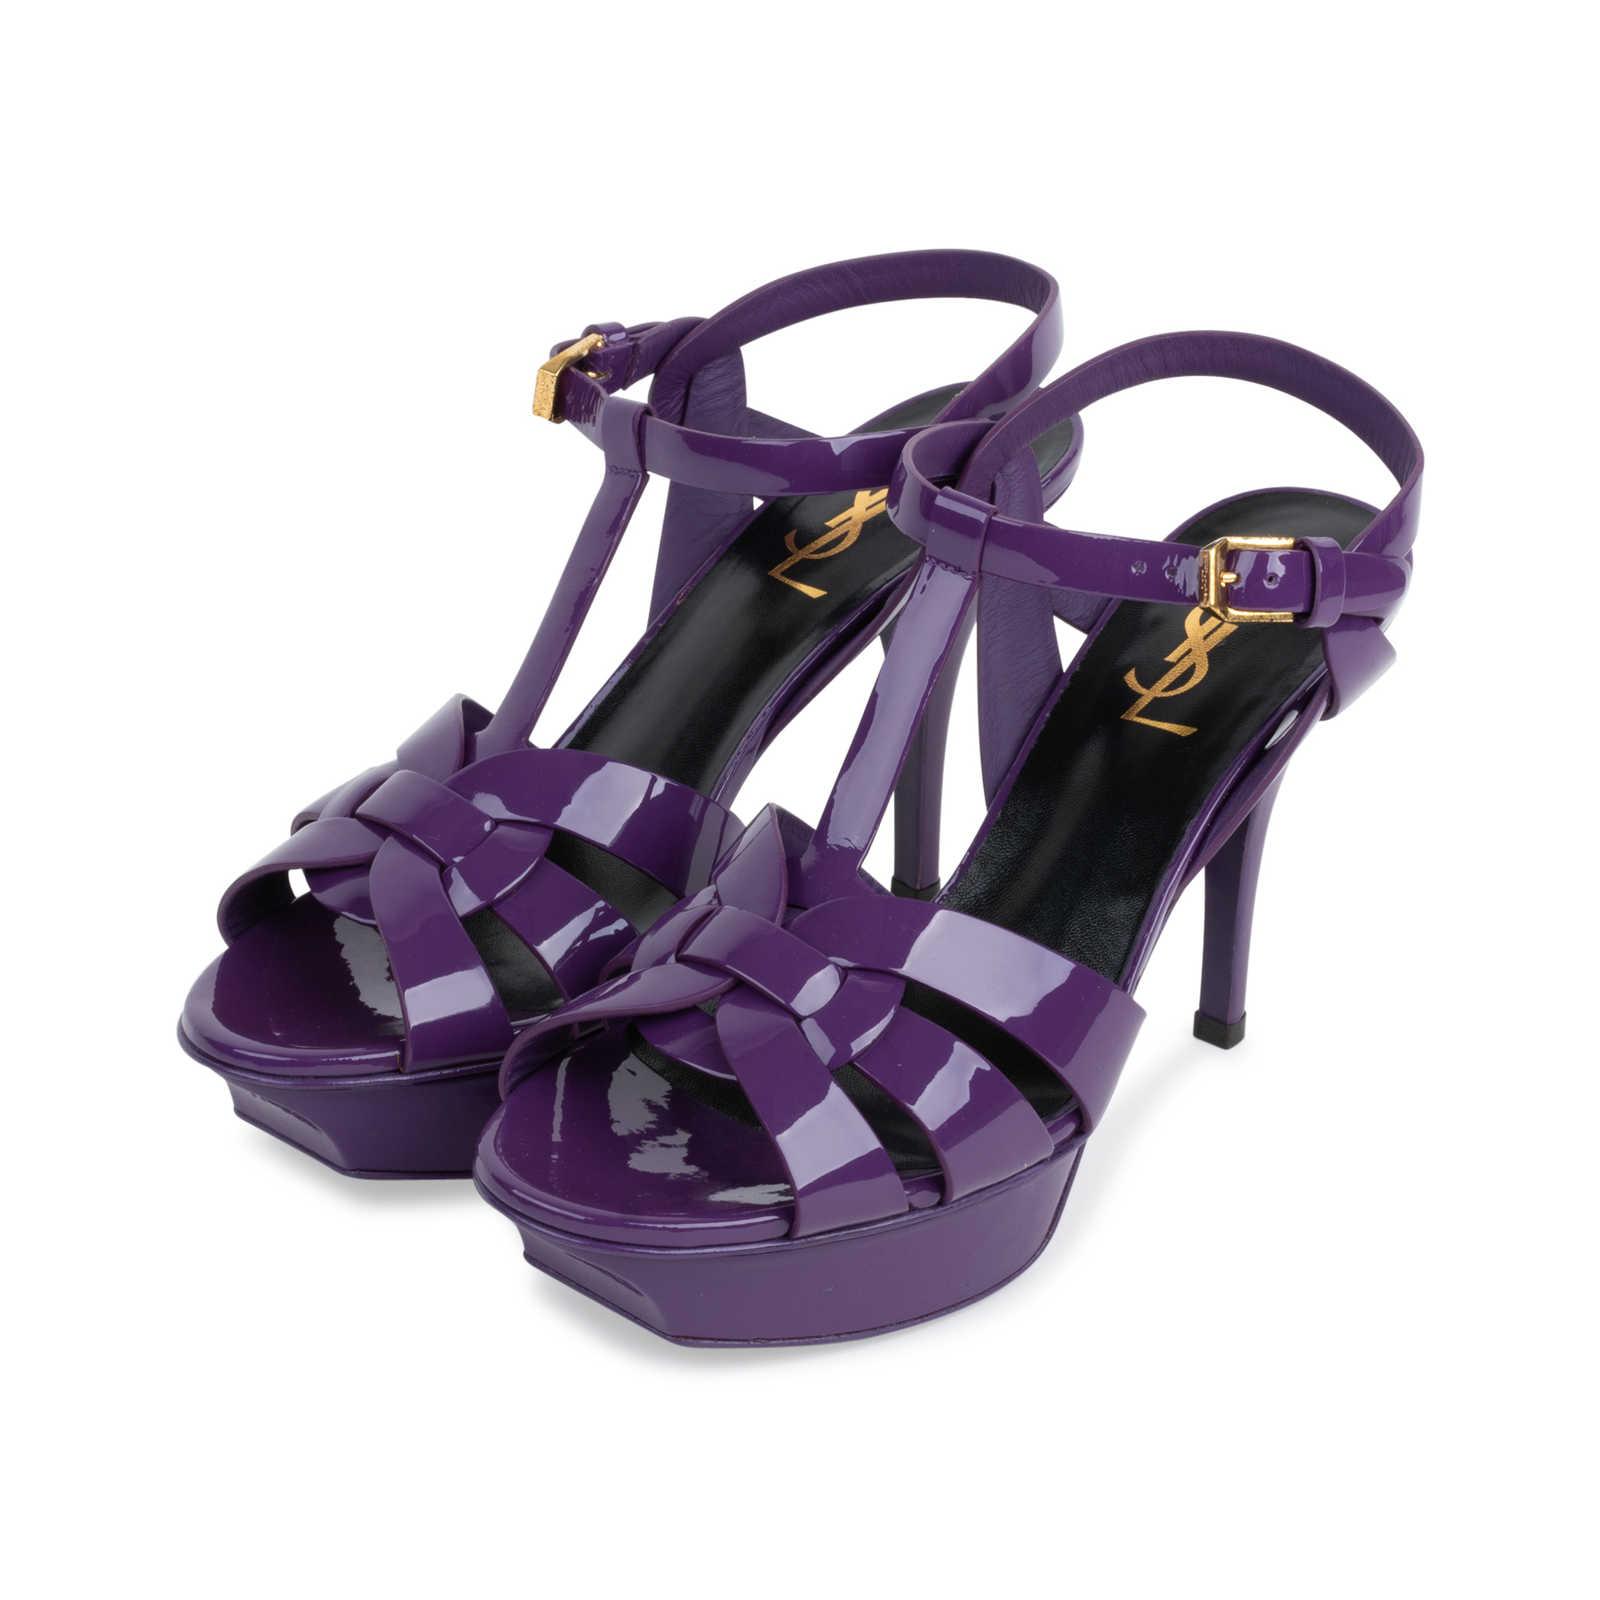 b5b6b4b4ab25 ... Authentic Second Hand Yves Saint Laurent Purple Tribute Sandals (PSS-566-00075)  ...